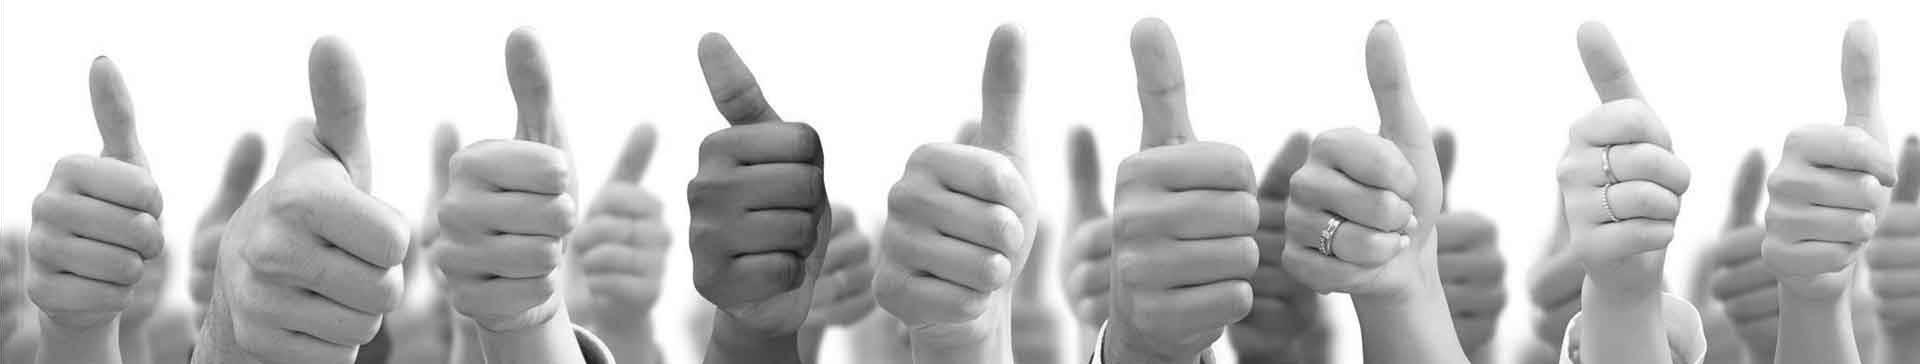 Speedwell Kia Reviews & Customer Testimonials